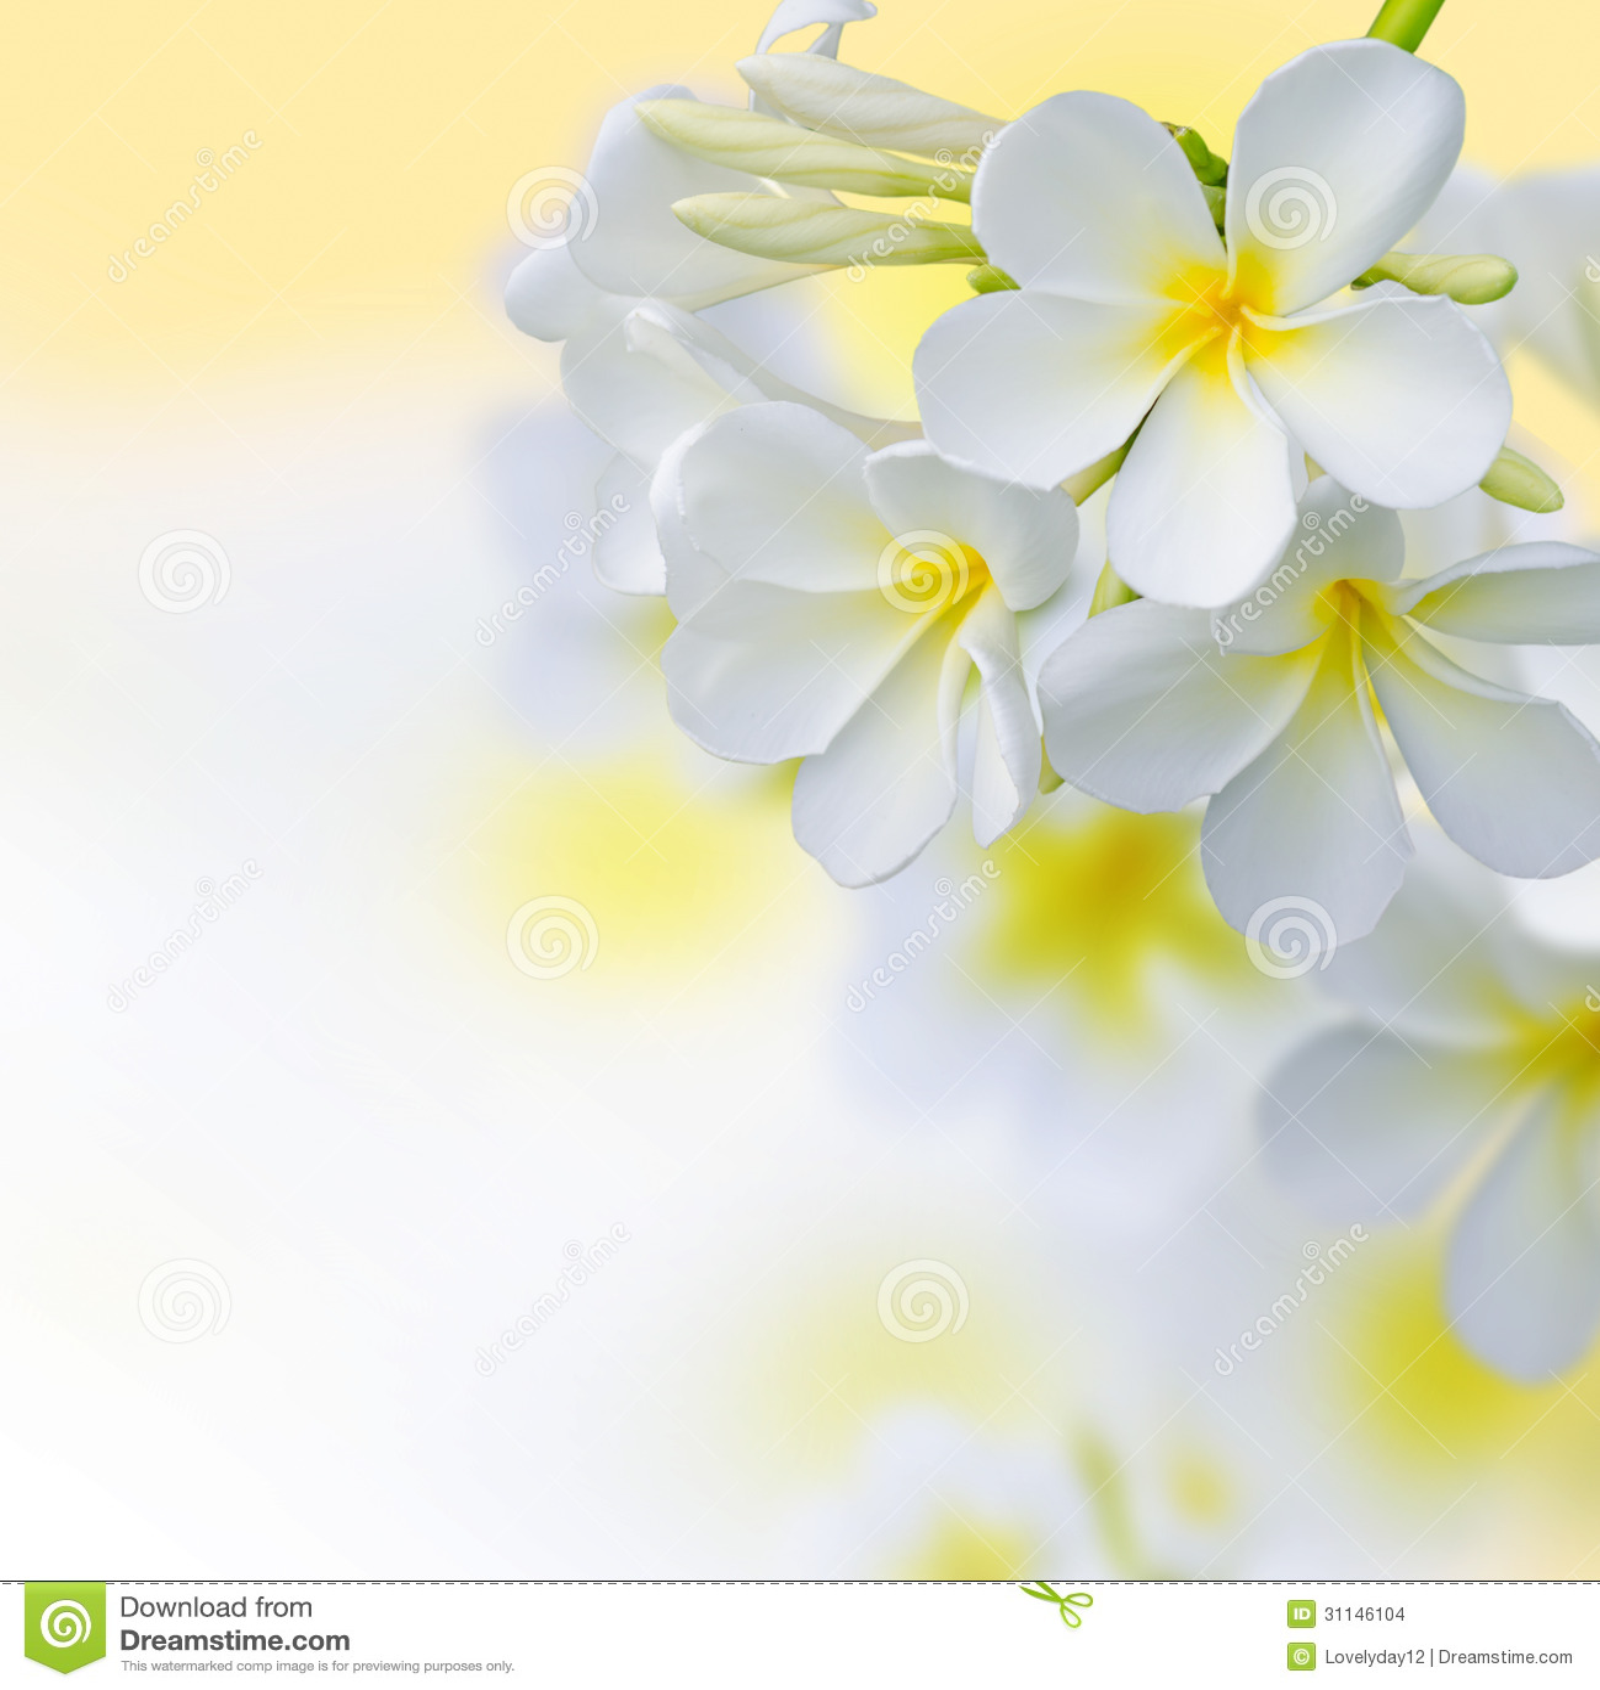 Tropical Flowers Frangipani (plumeria) Black And White Stock Photo - Image  of hawaiian, nature: 45027954